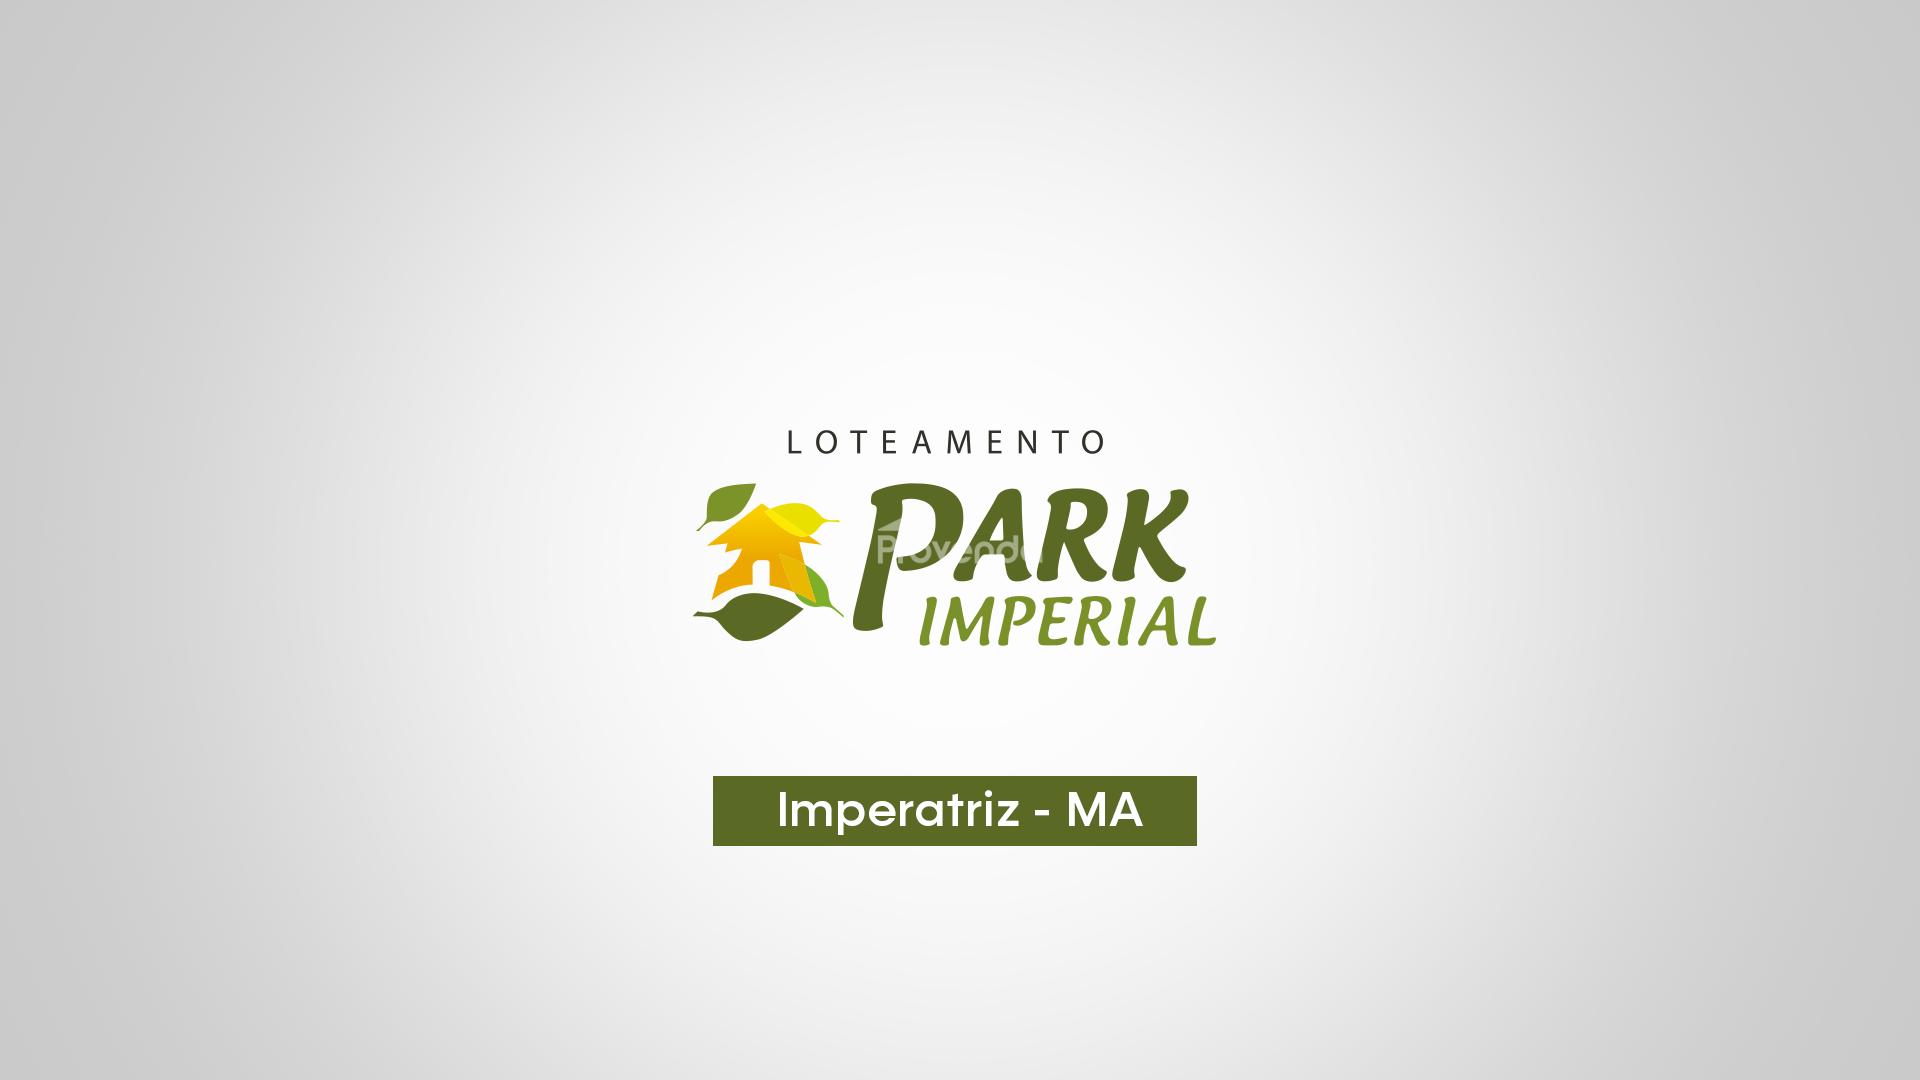 LOTEAMENTO PARK IMPERIAL